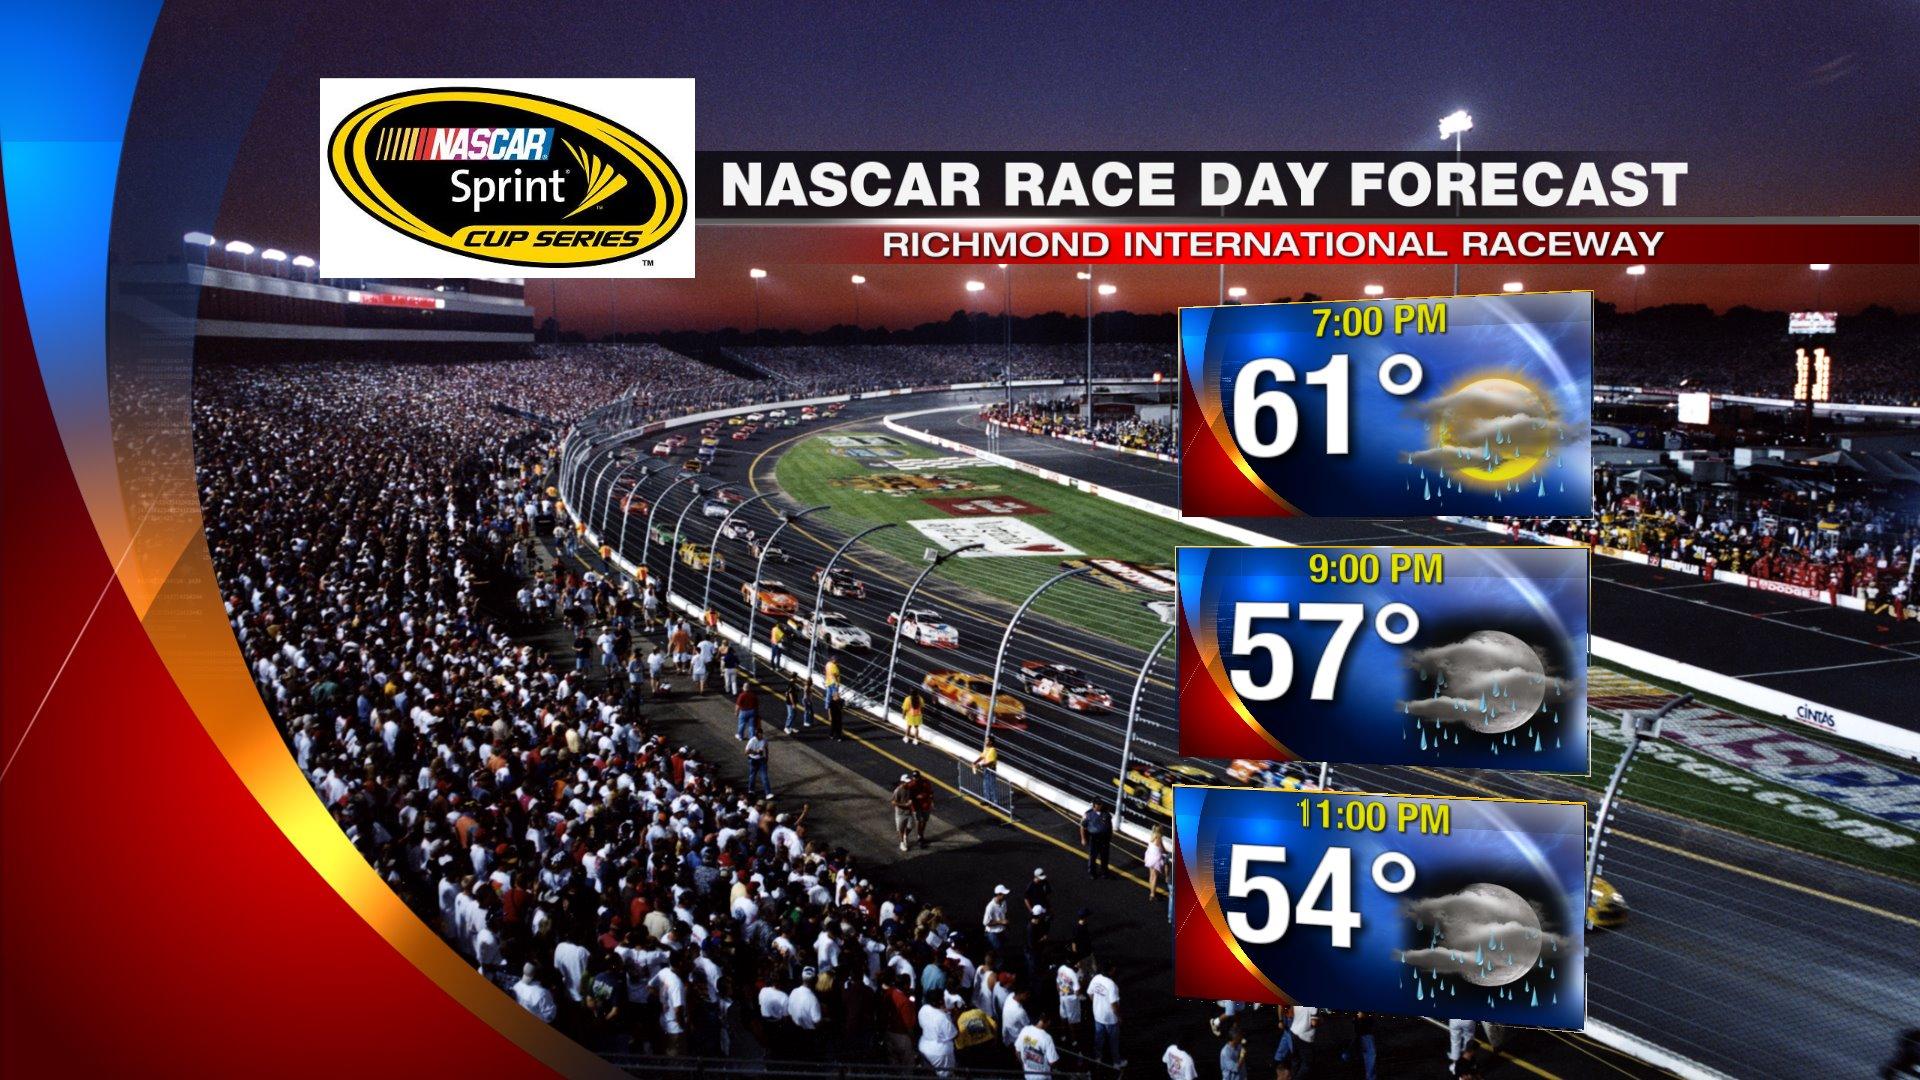 2012 Richmond International Raceway Nascar Race Day Weather Forecast Chance Of Showers Tonight Nascar Wx Man